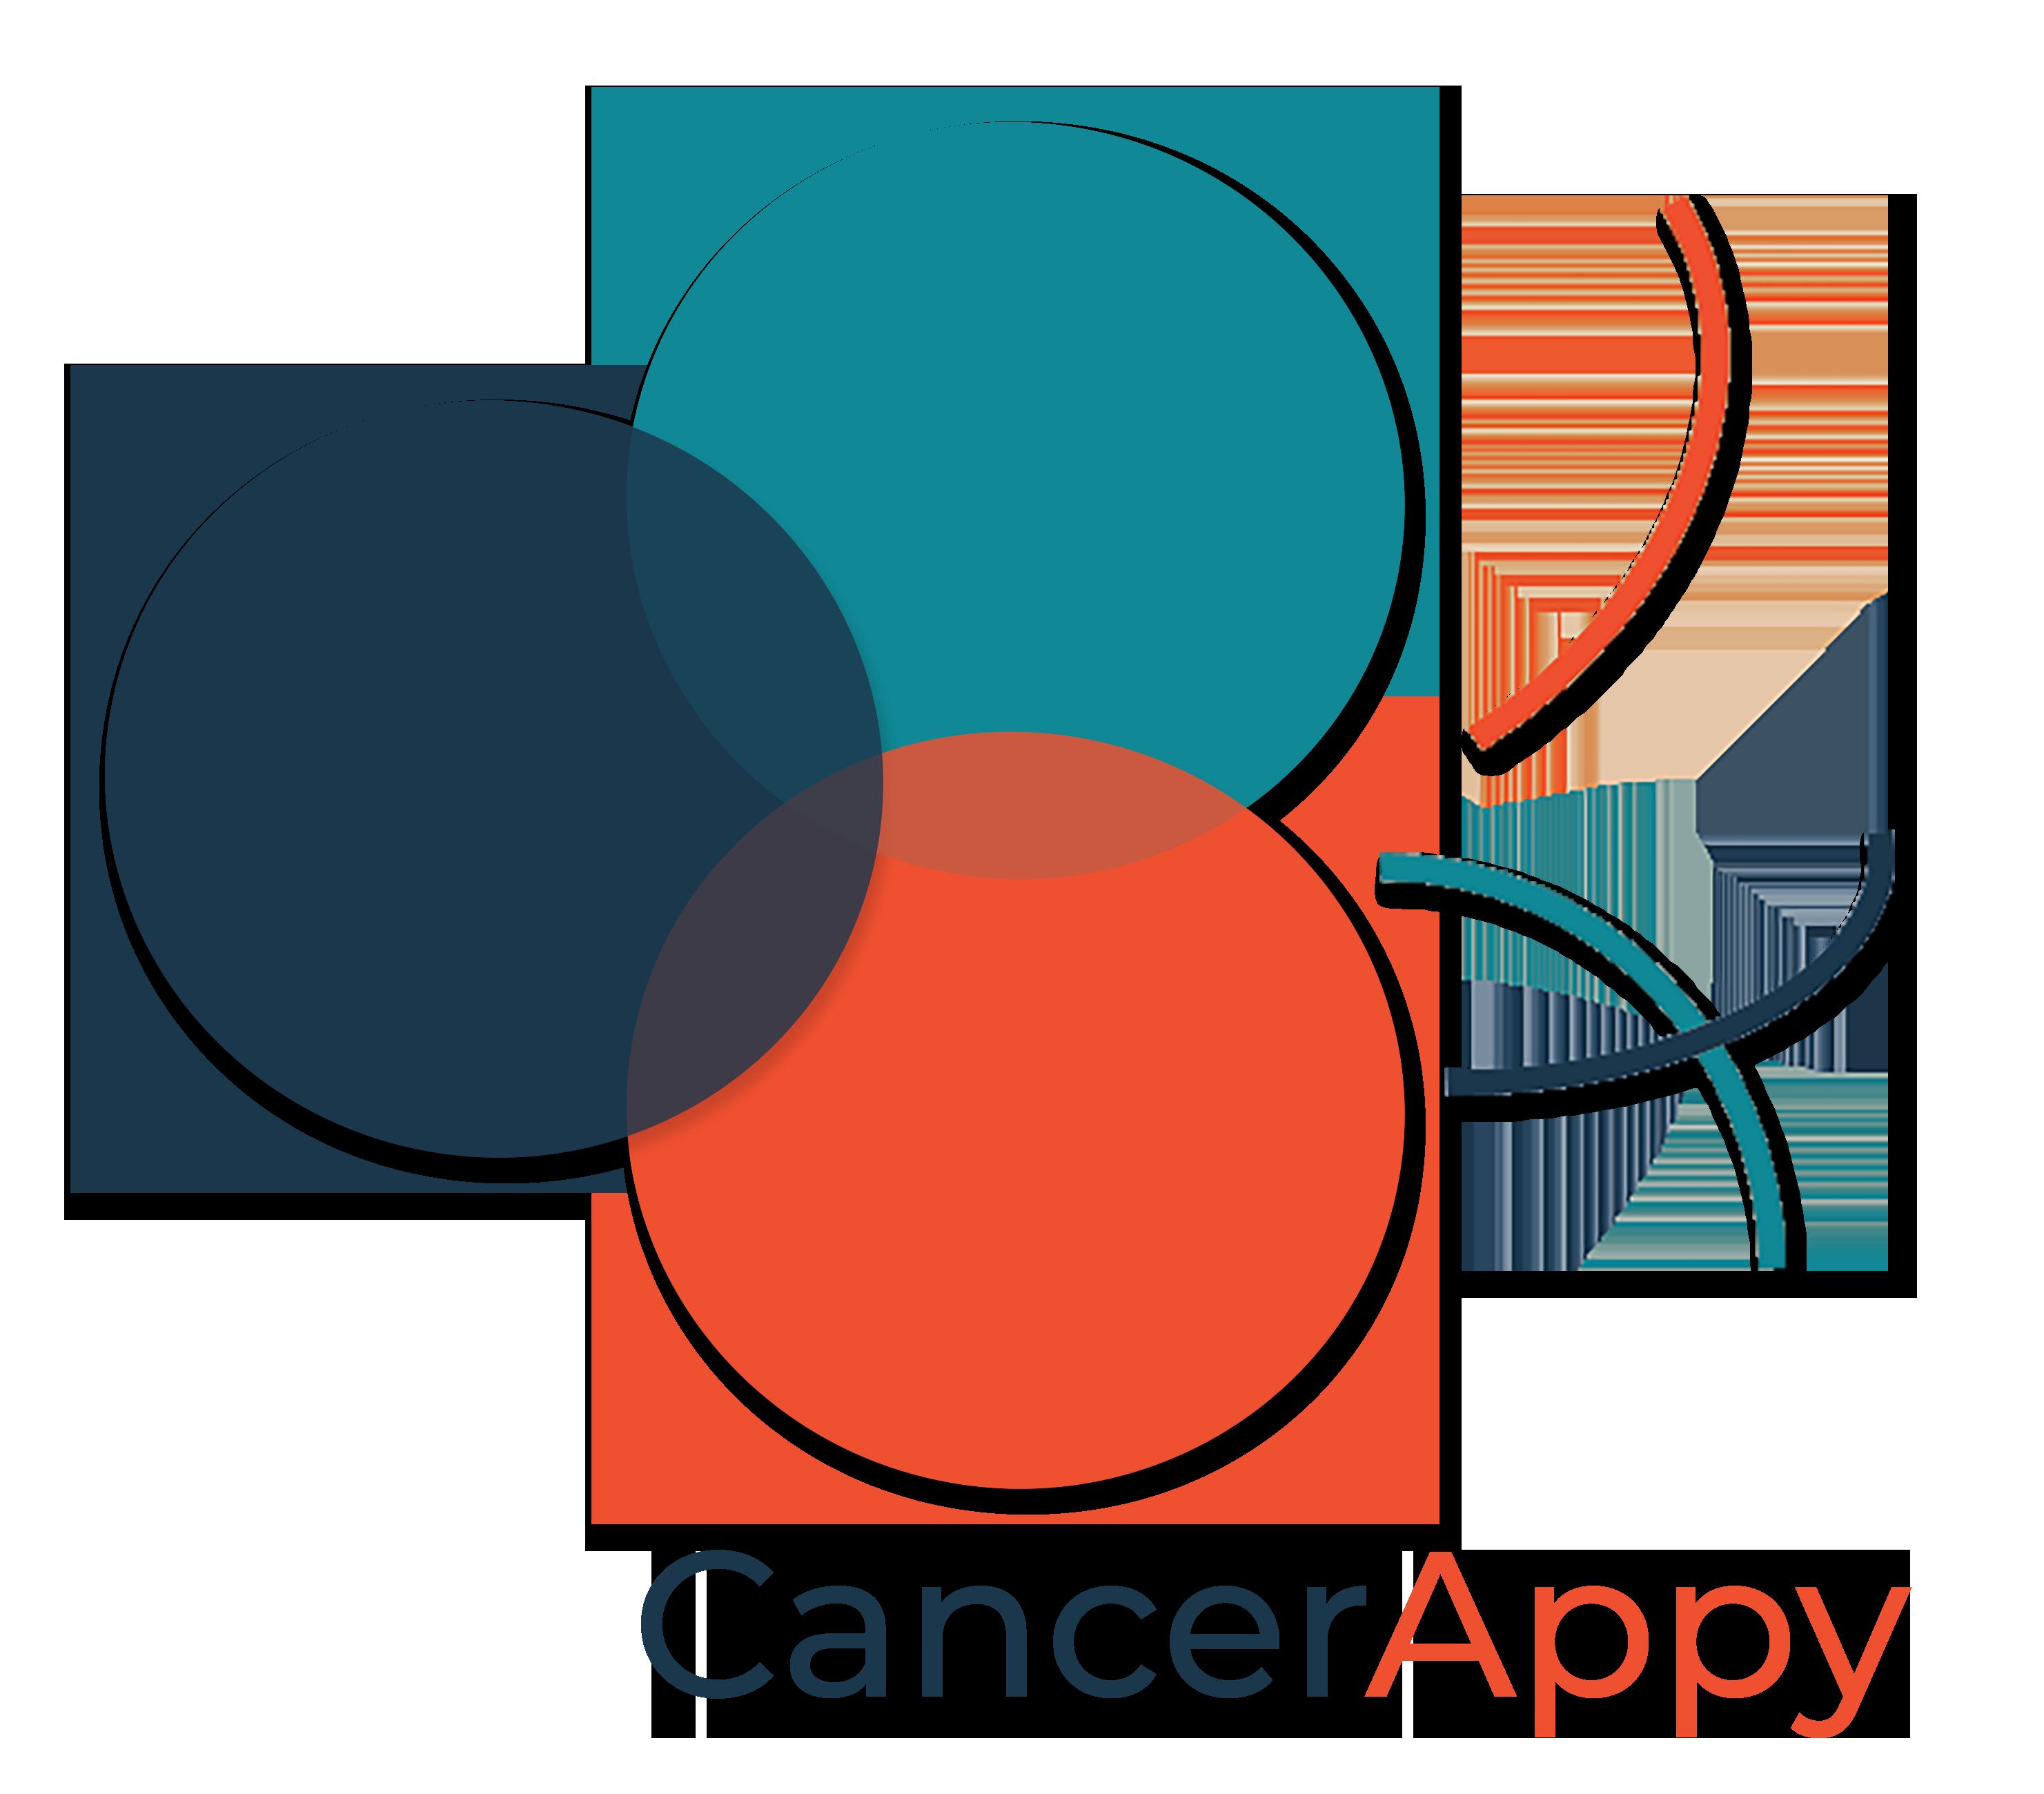 Cancerappy